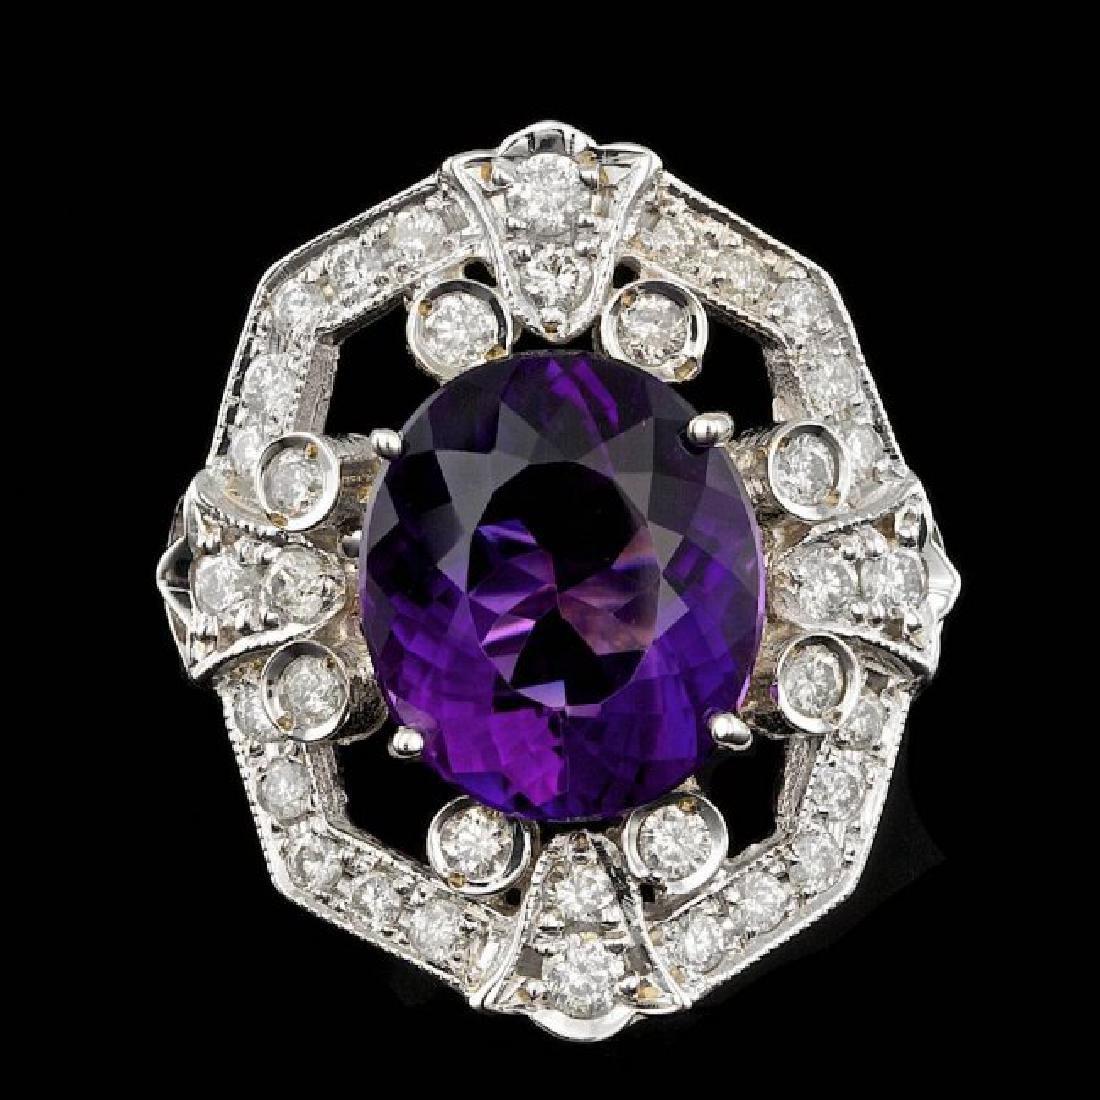 14k Gold 7.50ct Amethyst 2.60ct Diamond Ring - 2